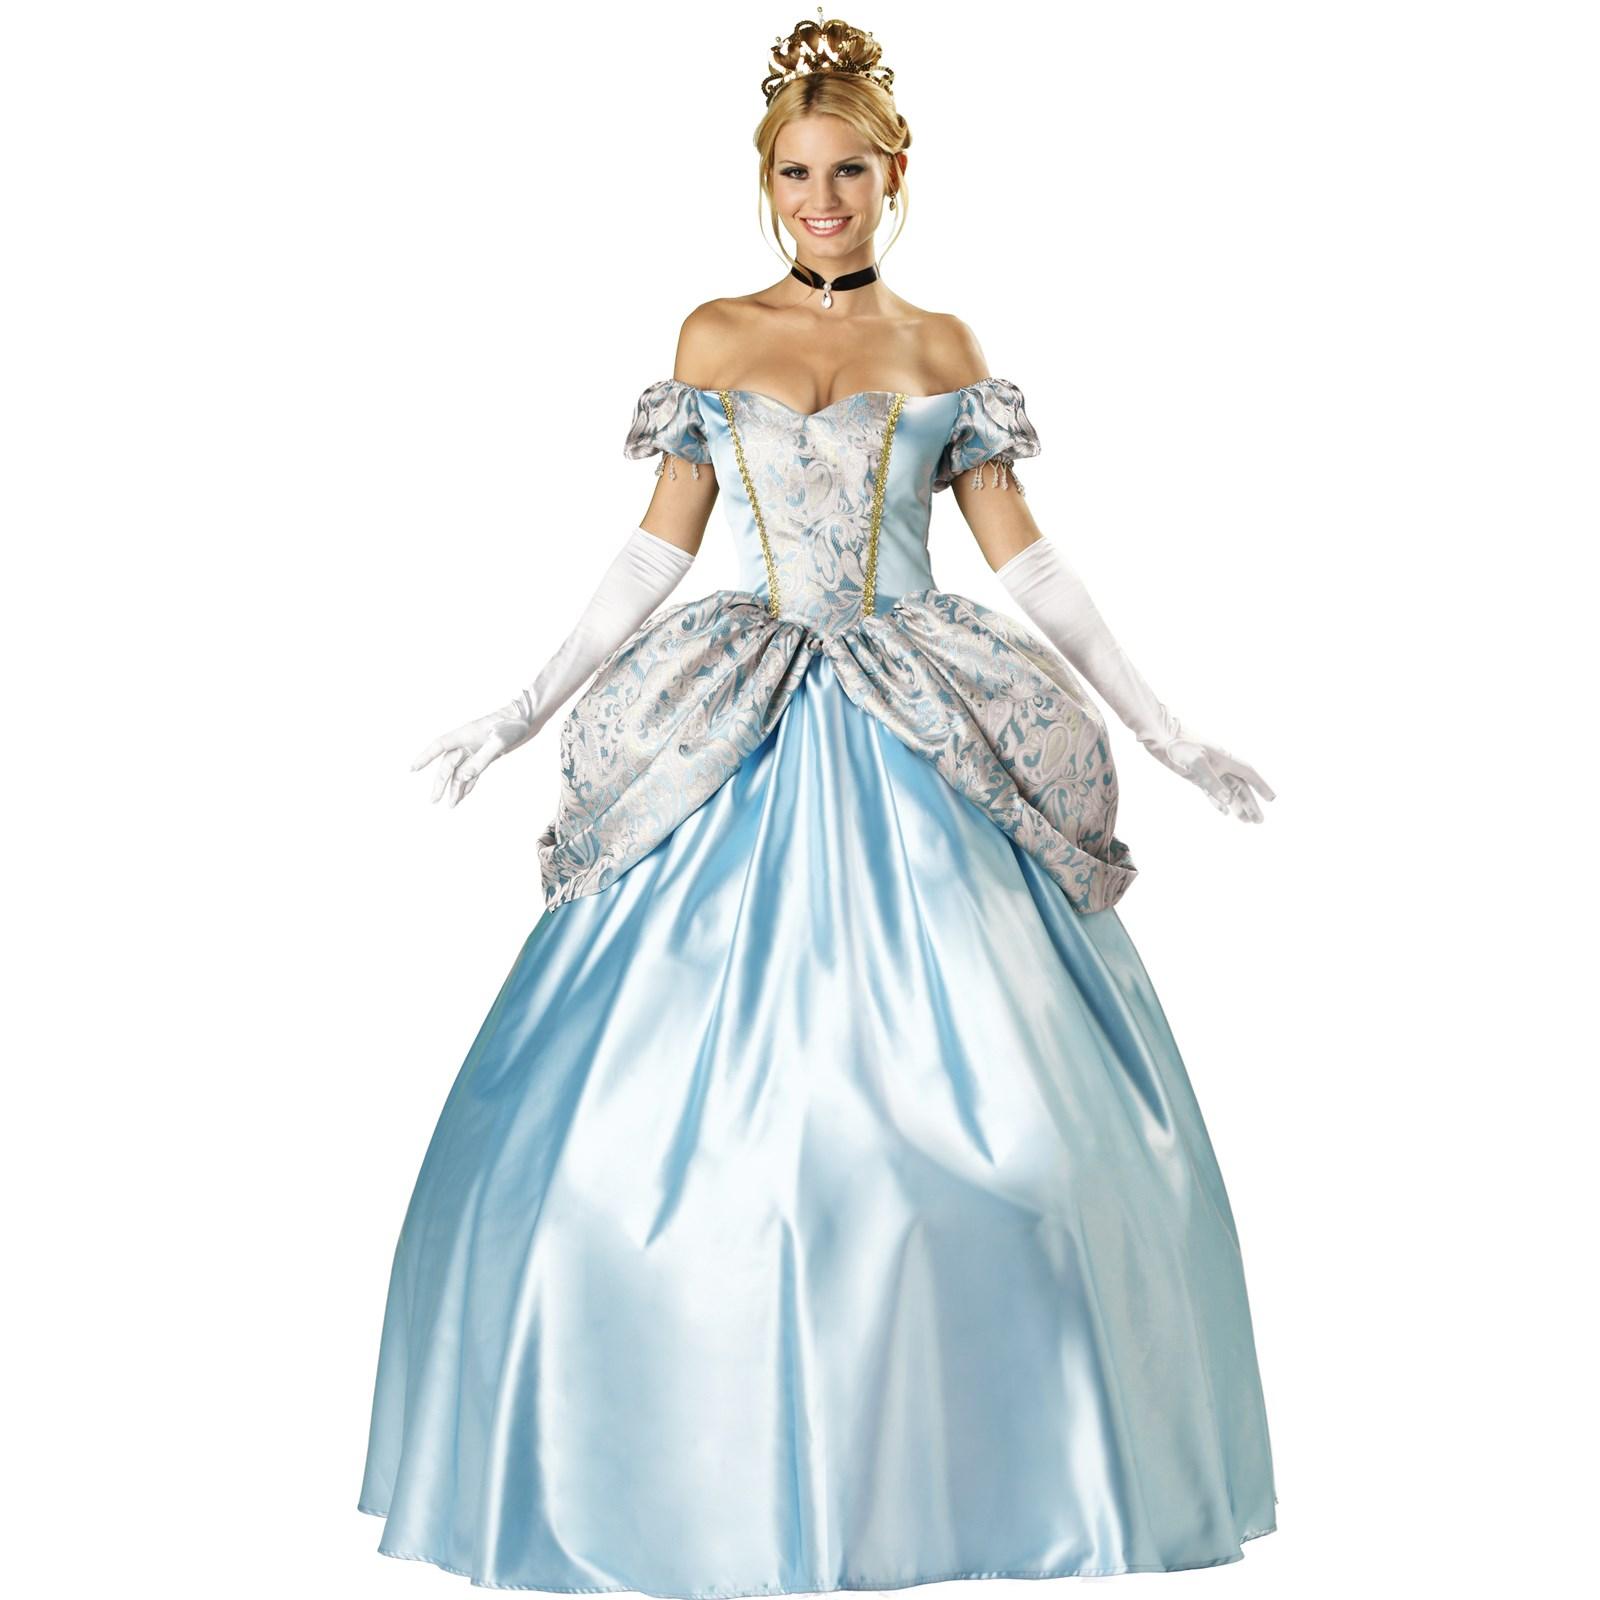 Disney princess gowns for adults - Default Image Enchanting Princess Elite Collection Adult Costume